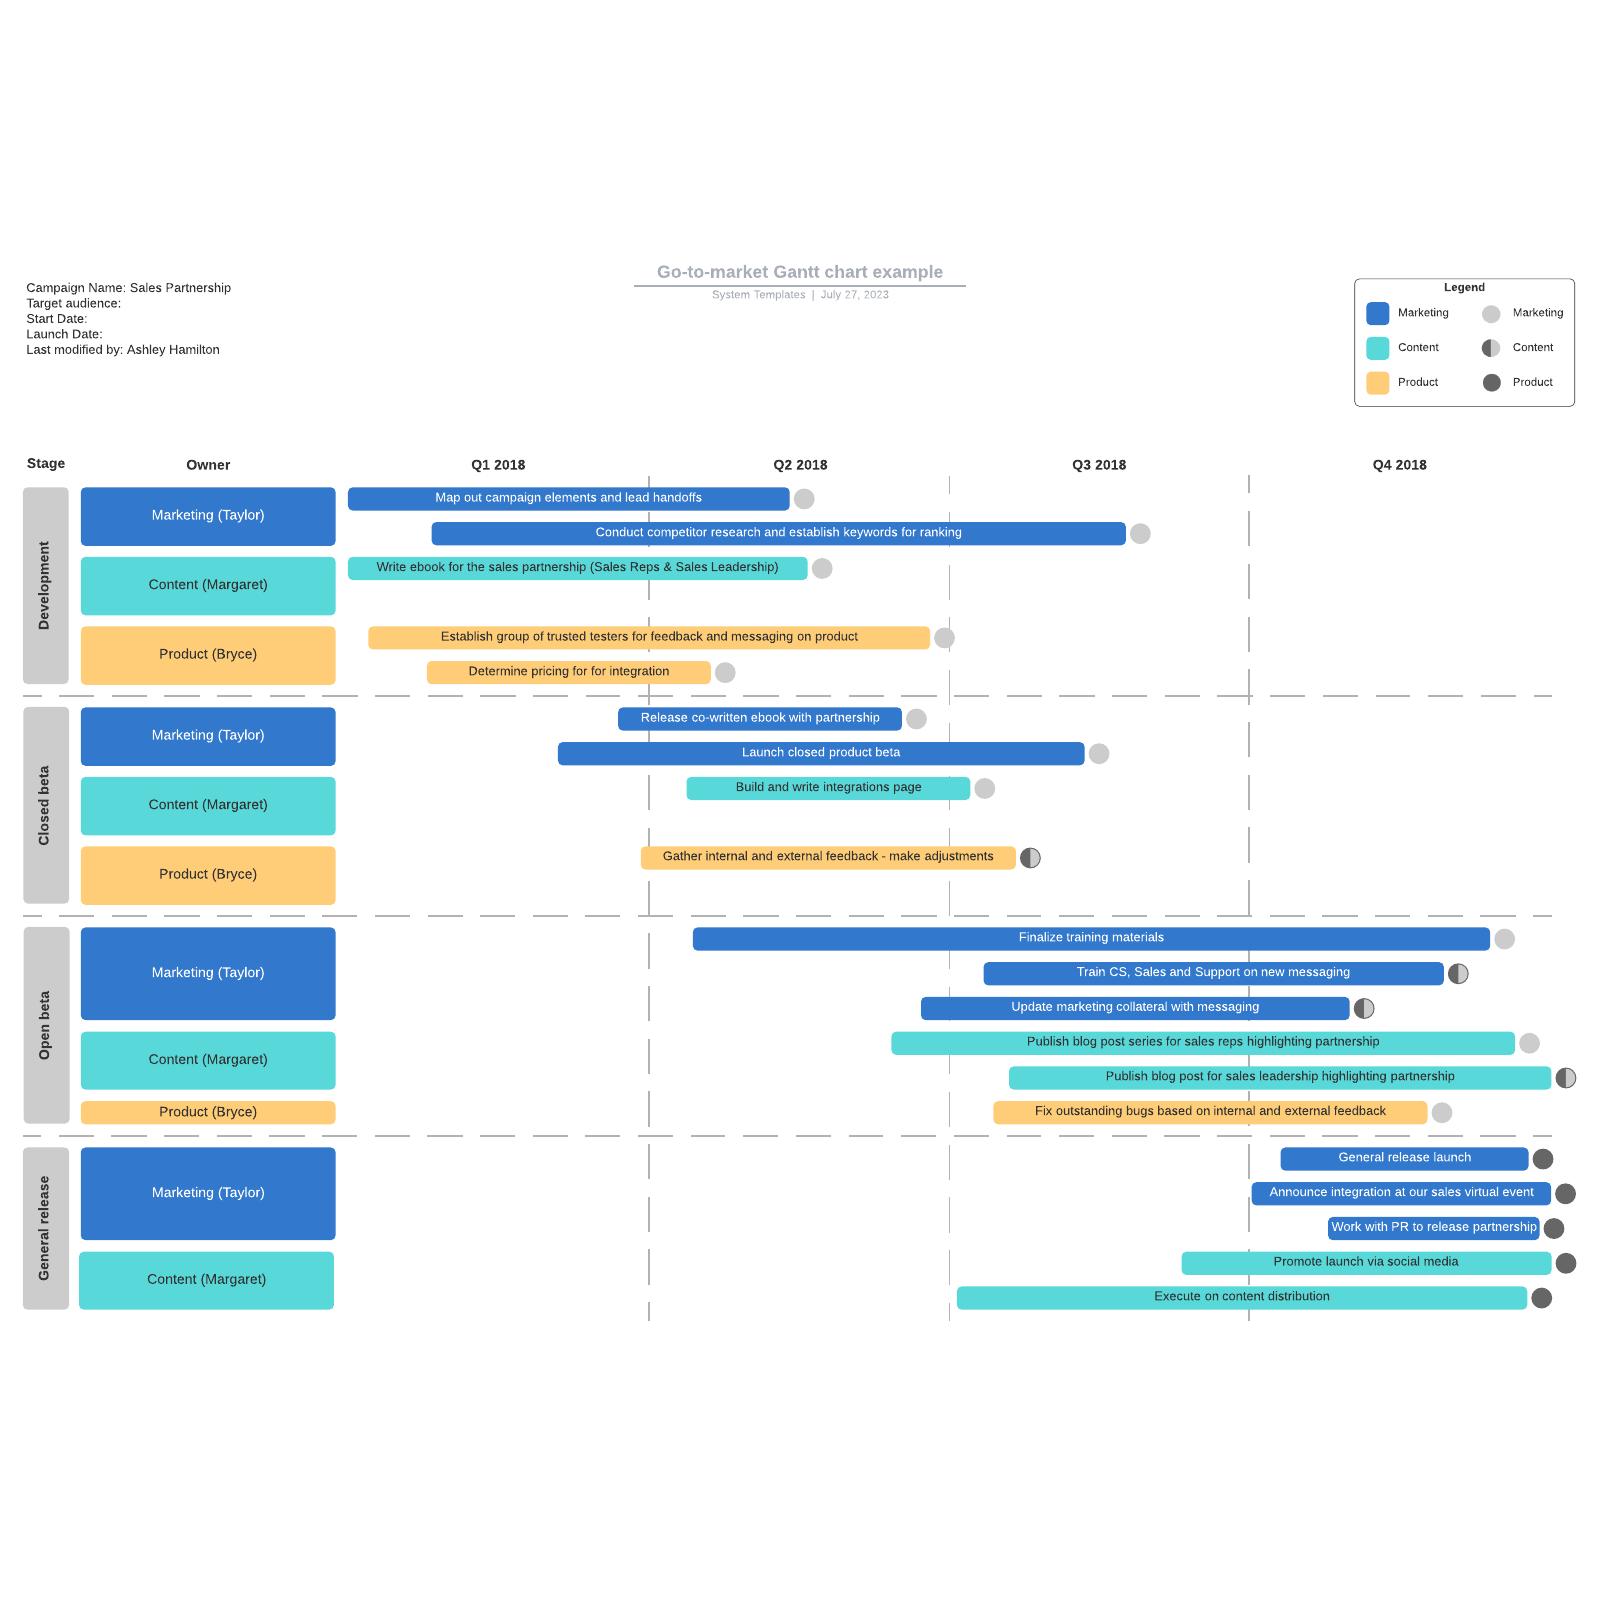 Go-to-market Gantt chart example